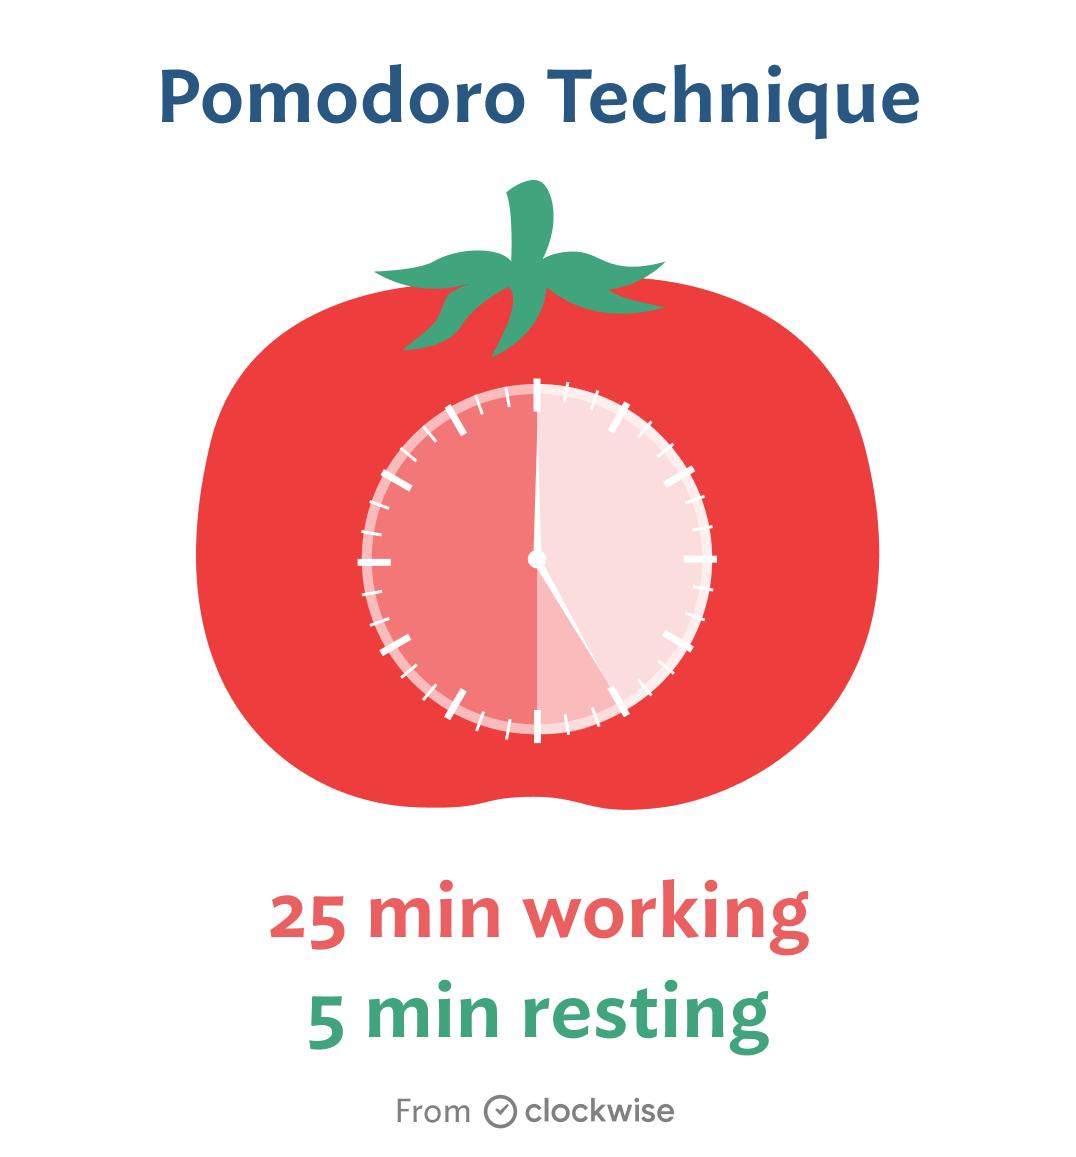 Pomodoro technique illustration